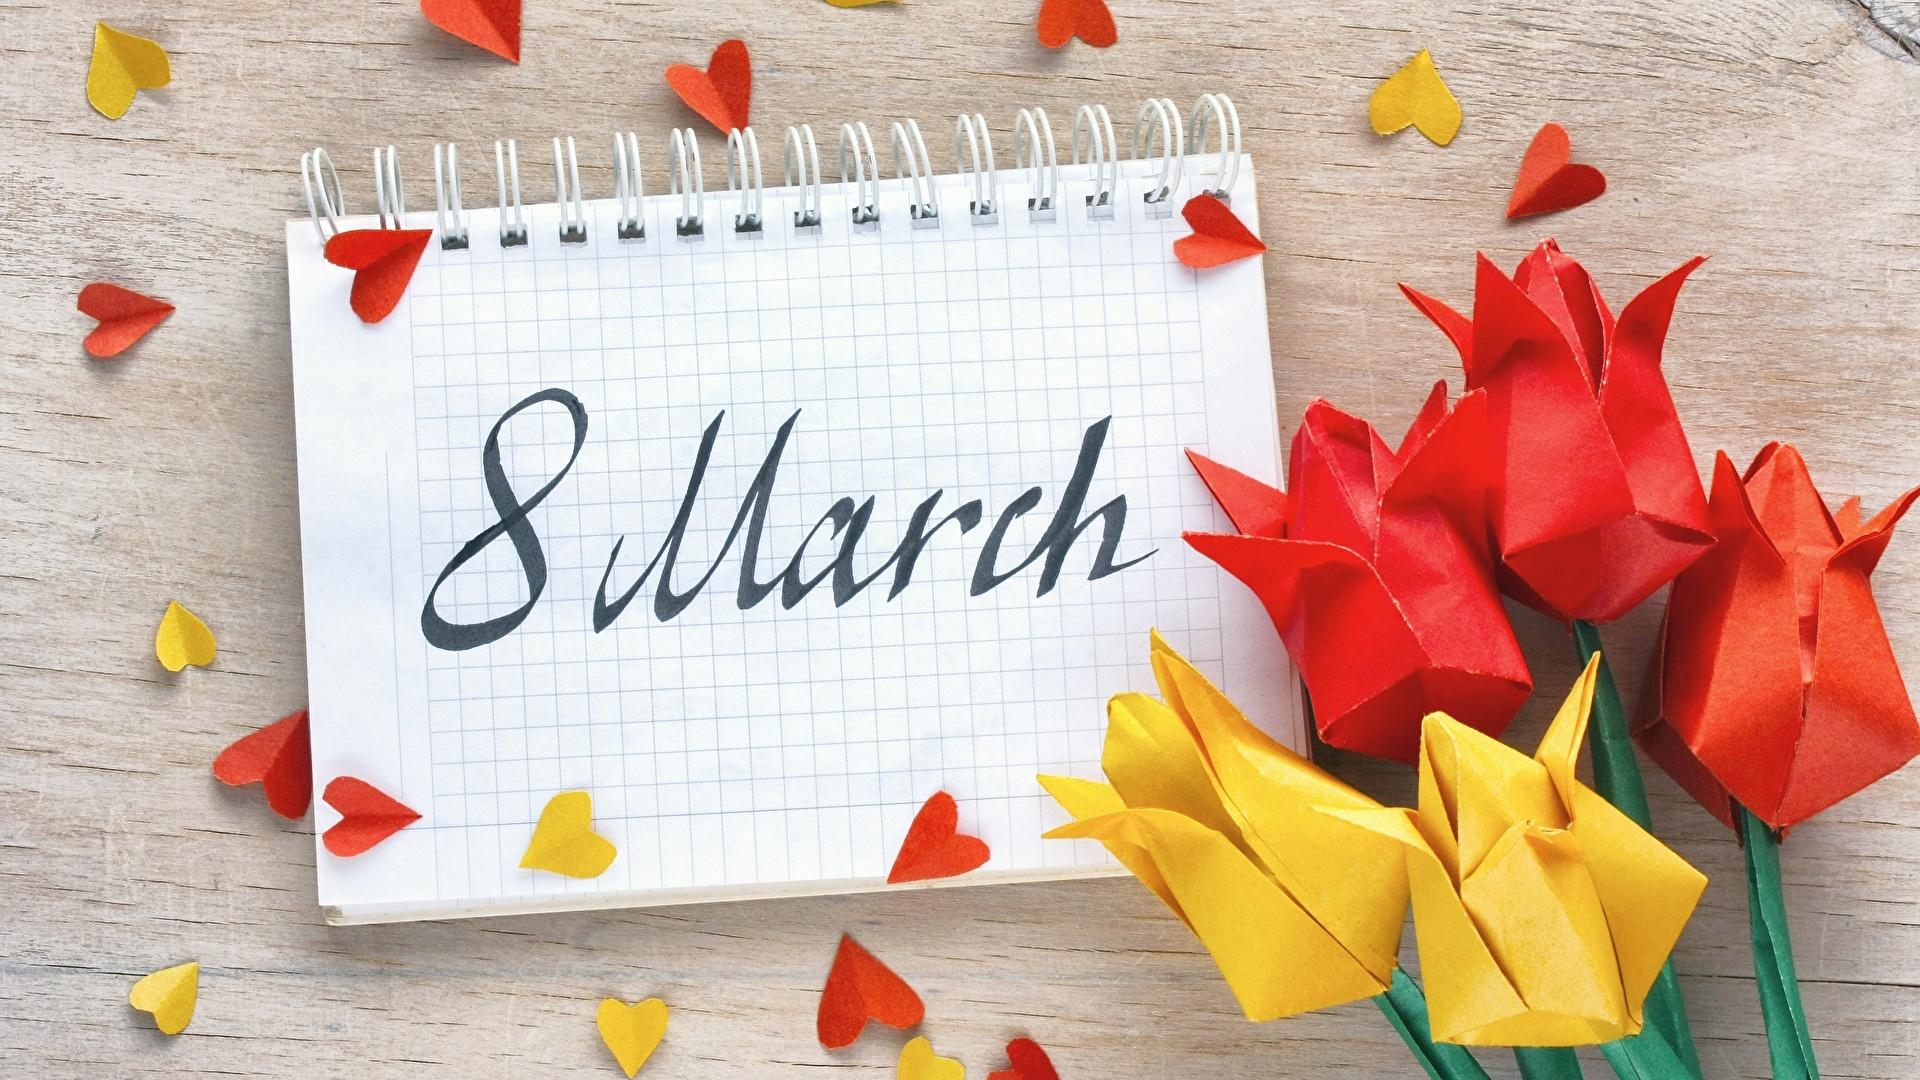 8th March HD Wallpaper